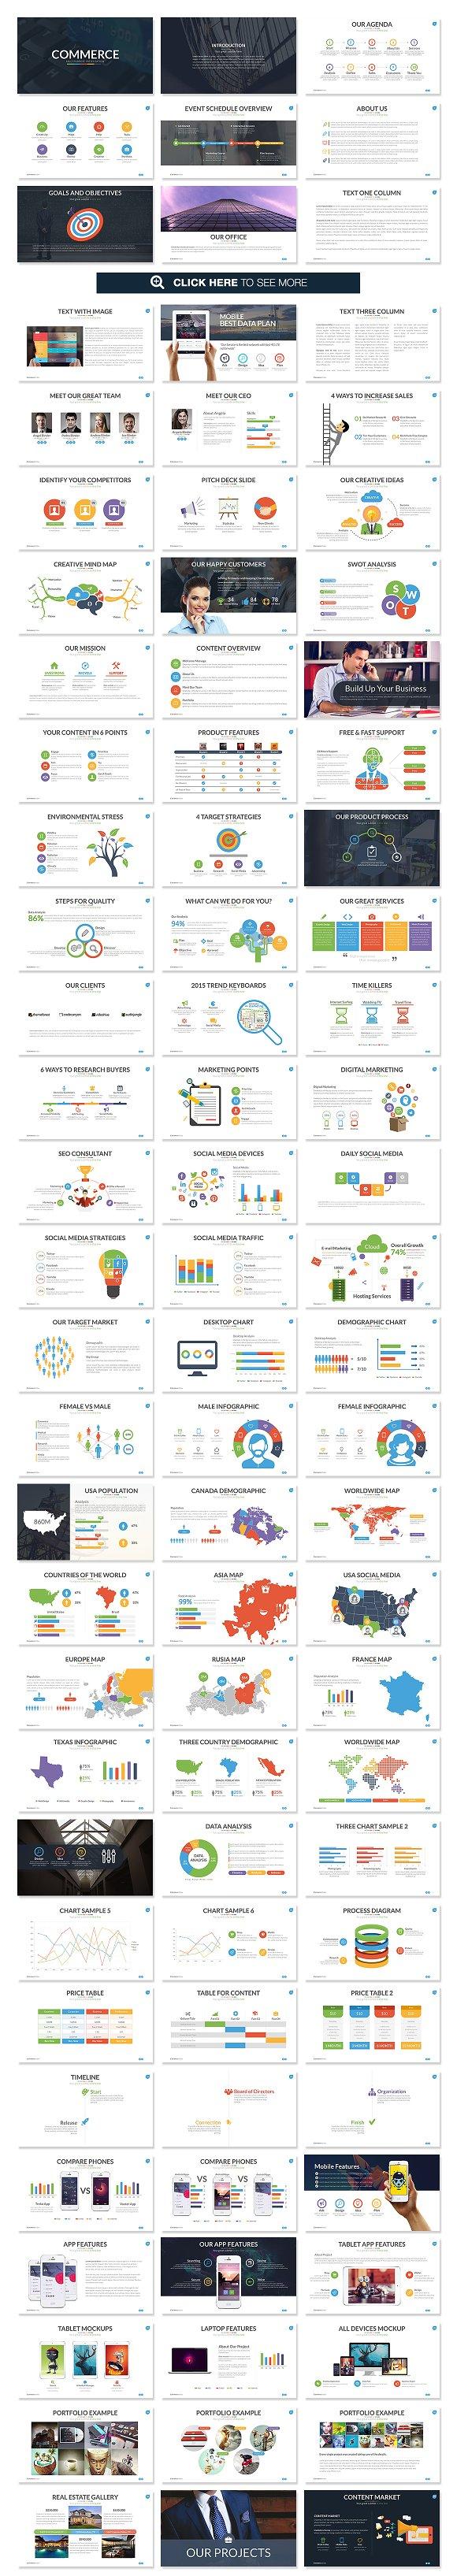 MEGA EMPIRE Powerpoint + Keynote ~ Presentation Templates ~ Creative ...